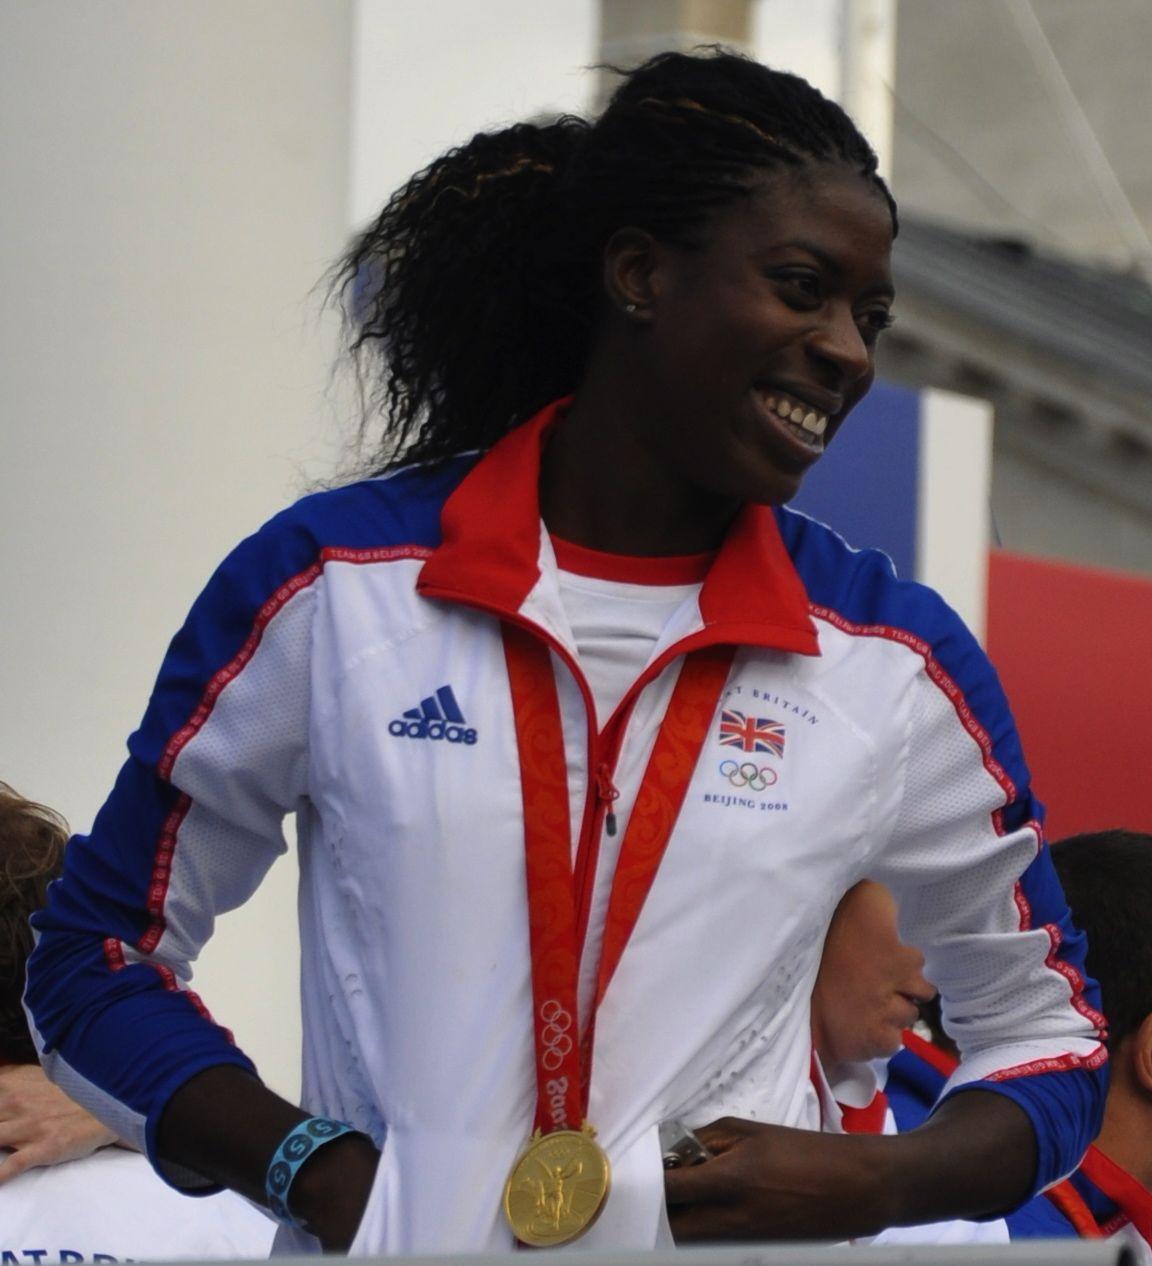 Christine Ohuruogu Athlete Christine ohuruogu, Athlete